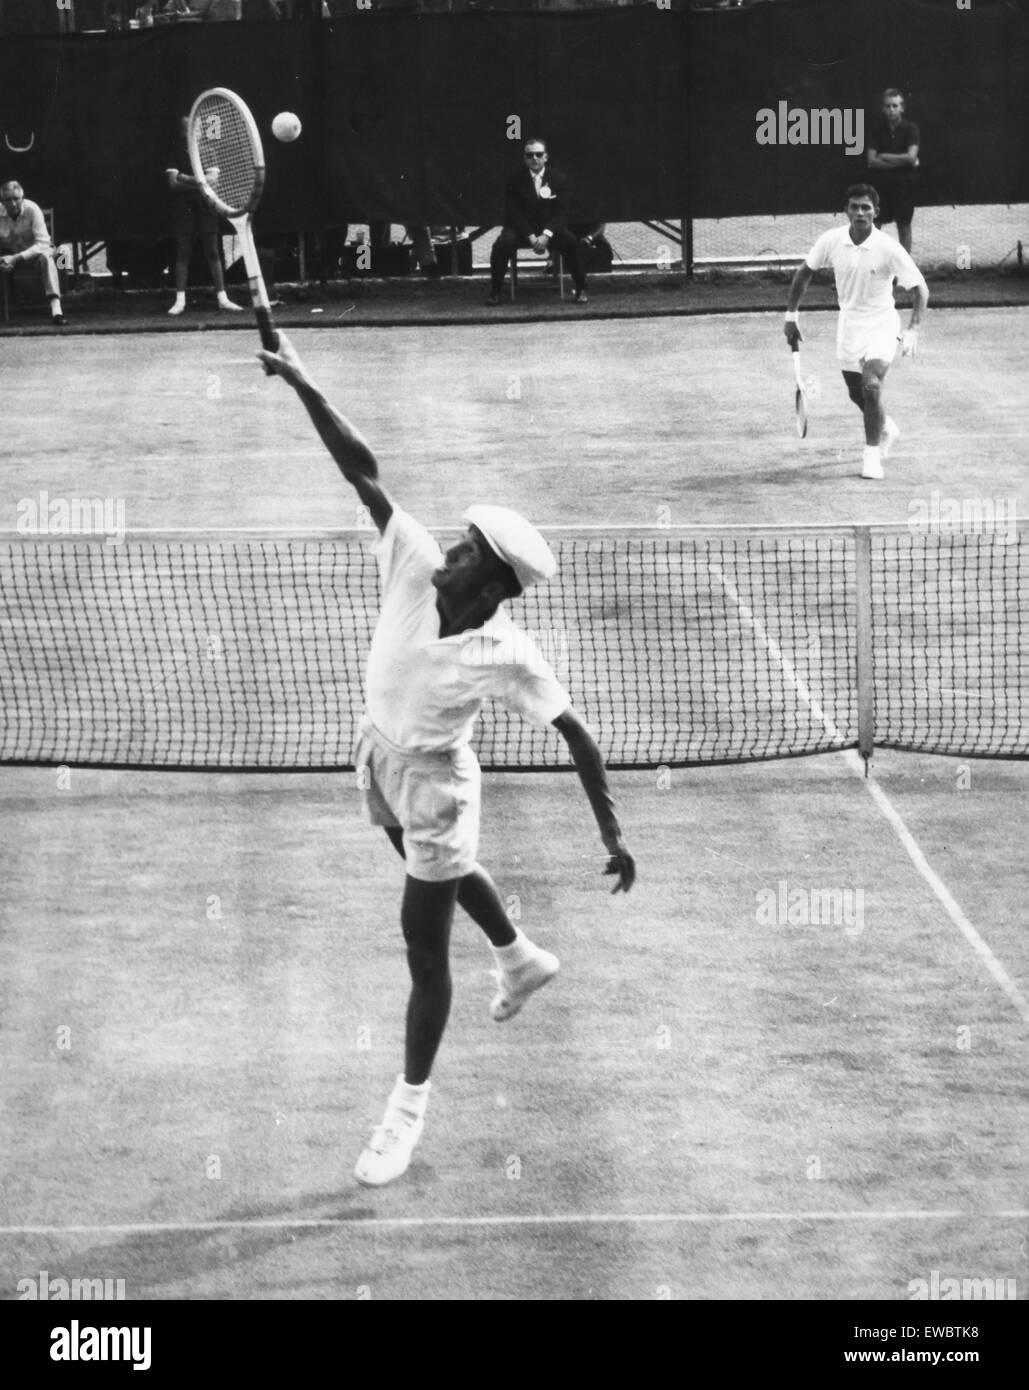 ken rosewall,1955 - Stock Image